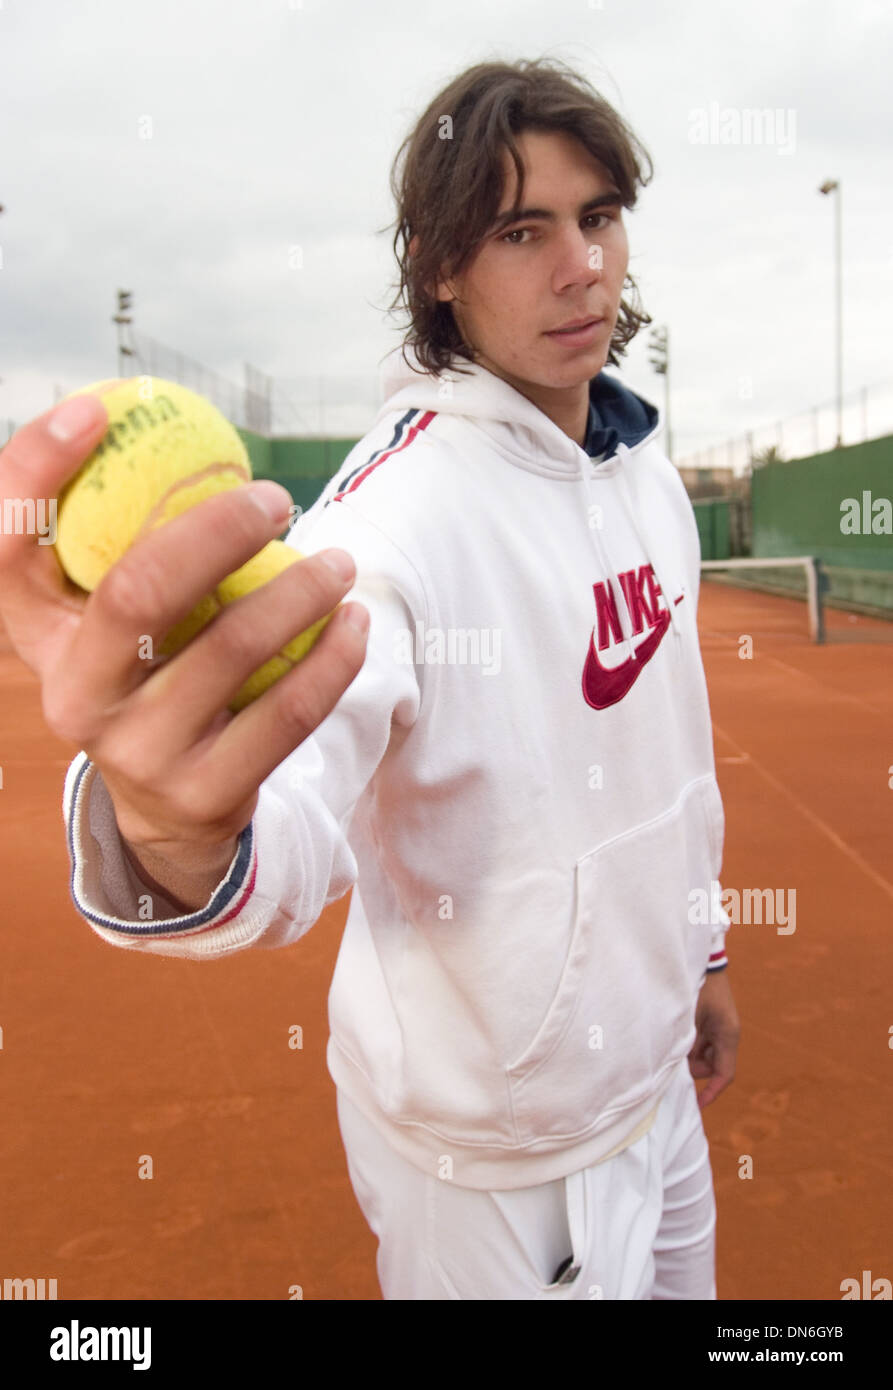 Rafa Nadal Pose At His Birthplace Tennis Club At Manacor Majorca Stock Photo Alamy